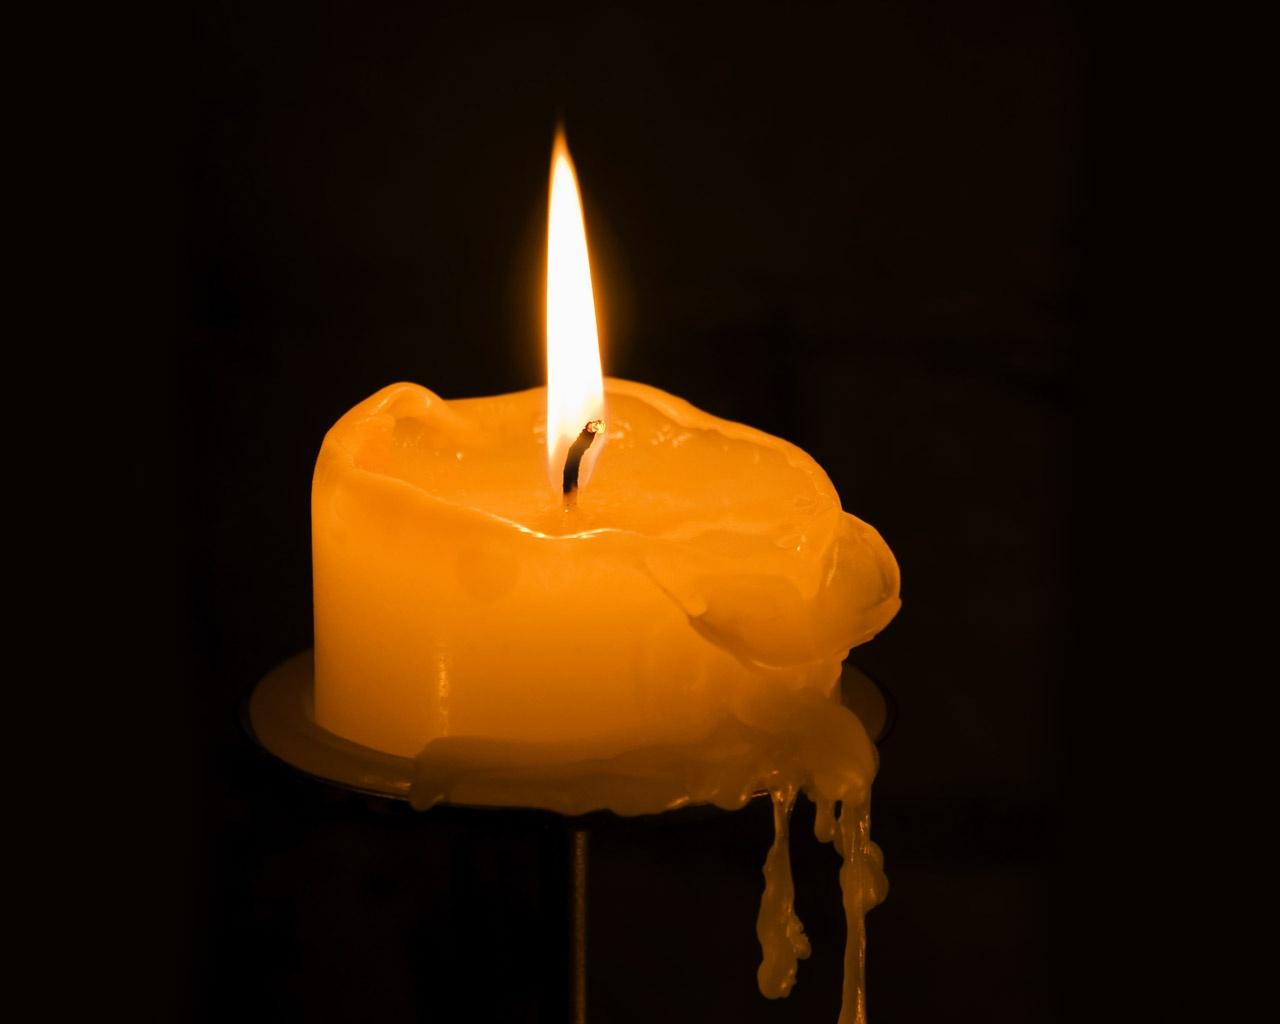 work stress burnout low candlelight.jpg